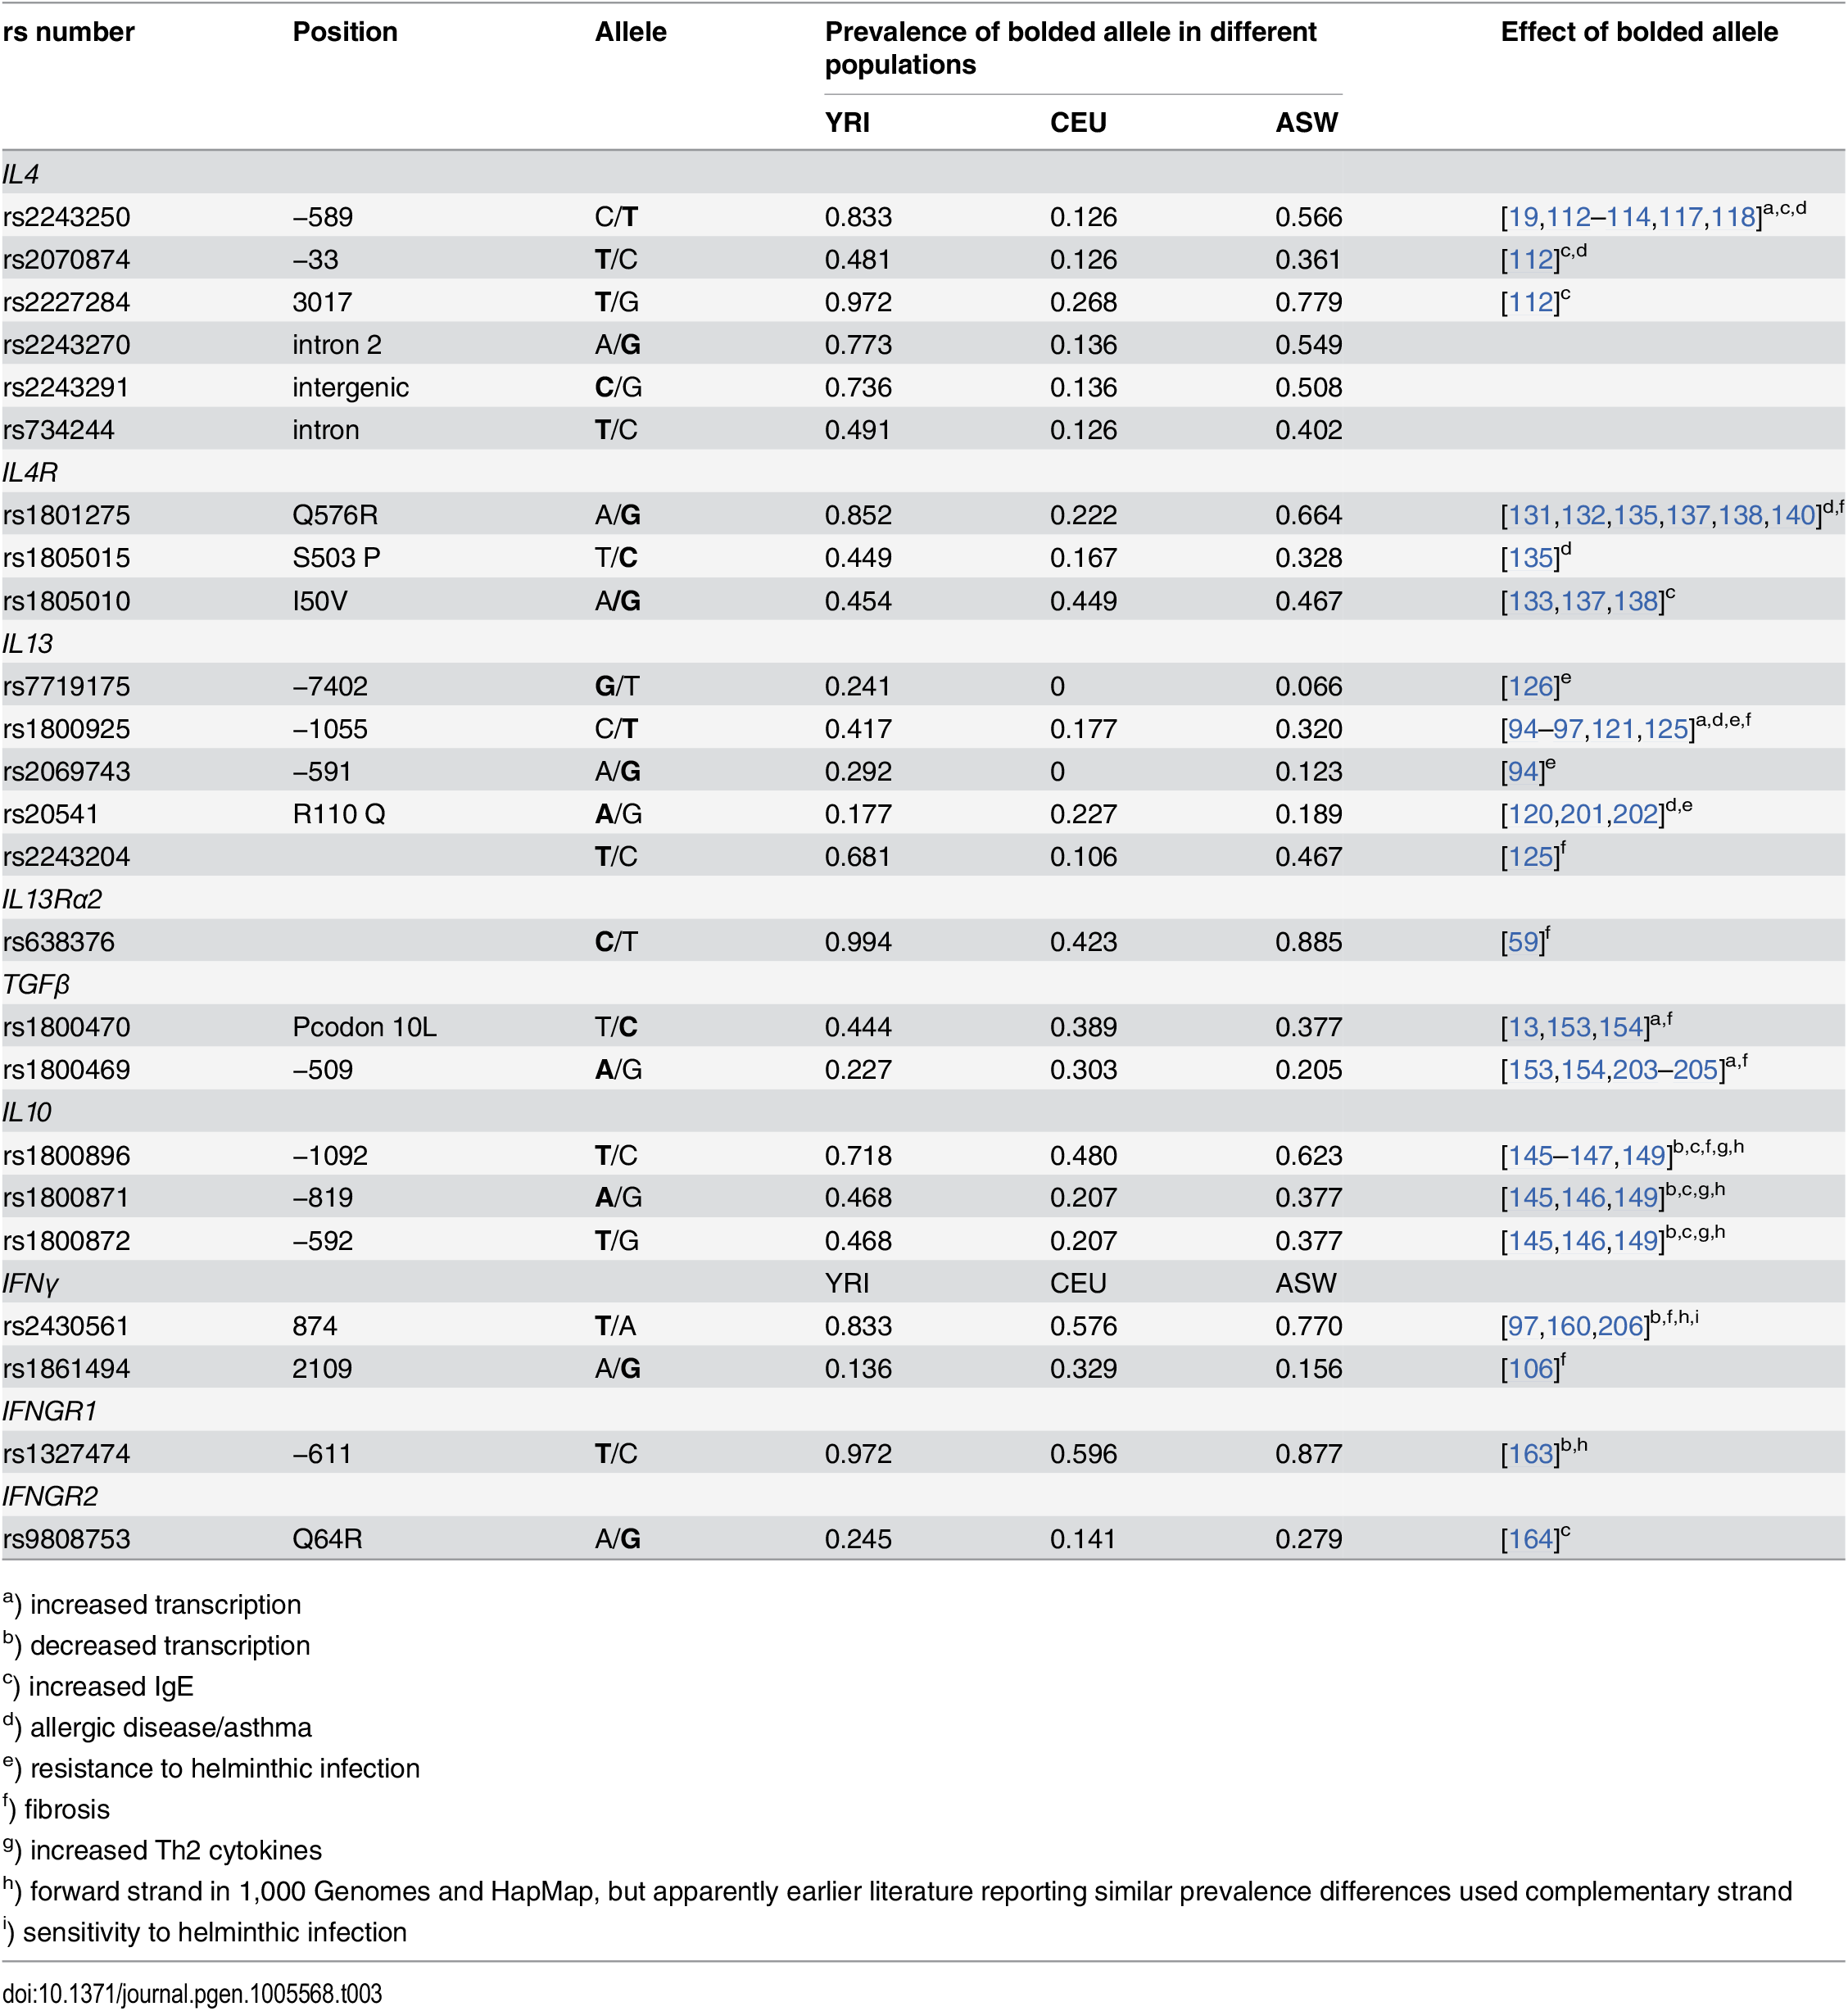 Population-specific allele frequencies (1,000 Genomes, 16 October 2014 release).